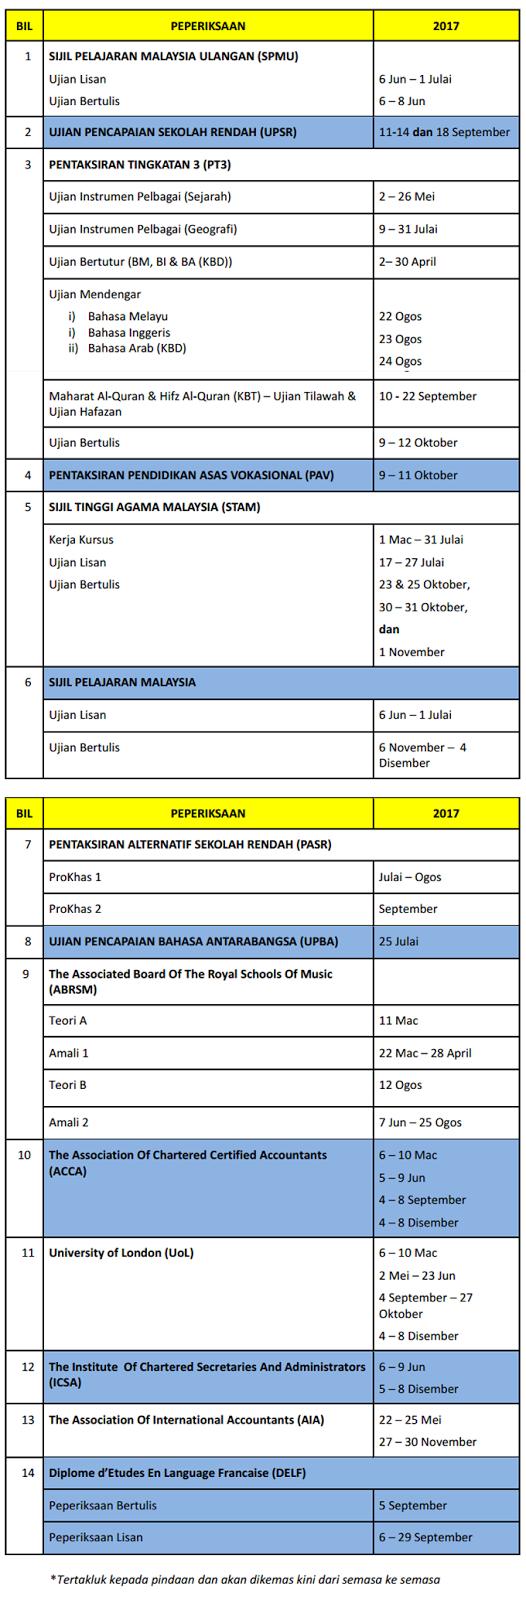 Takwim Jadual Peperiksaan 2017 - SPM, STAM, UPSR, PT3 ..